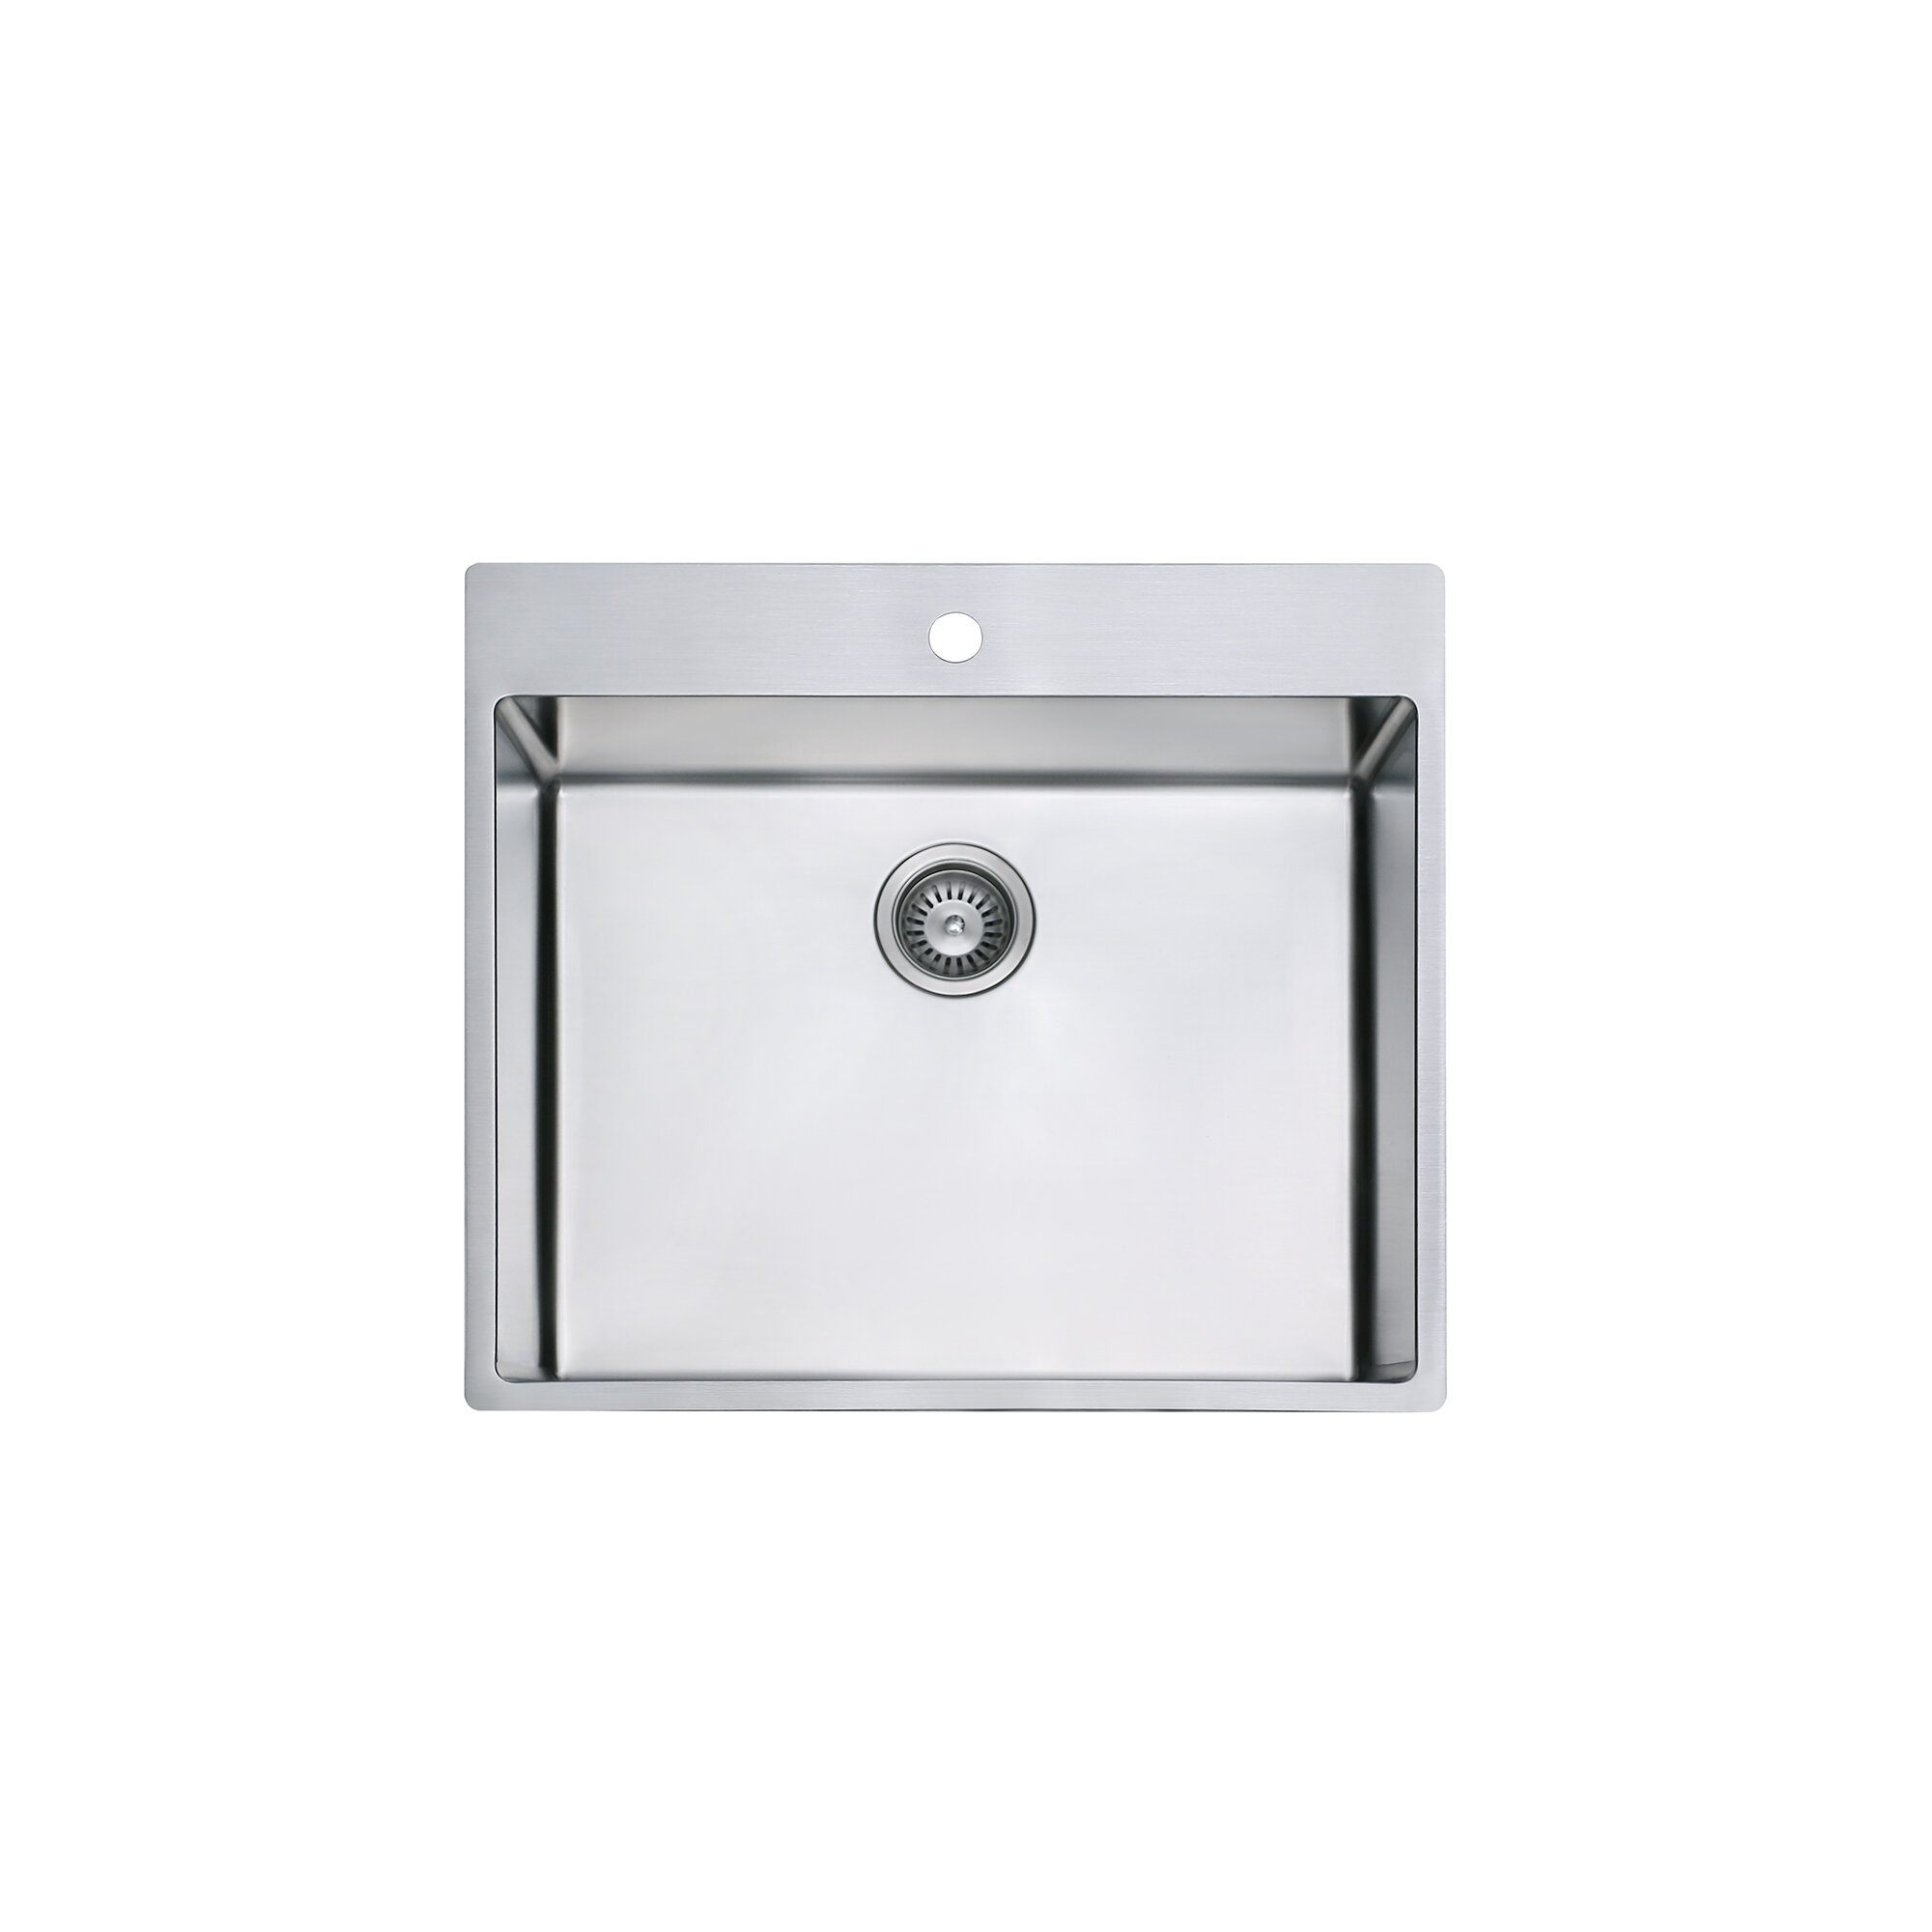 Be Hope Single Undermount Kitchen Sink 25 Inch Stainless Steel Wayfair